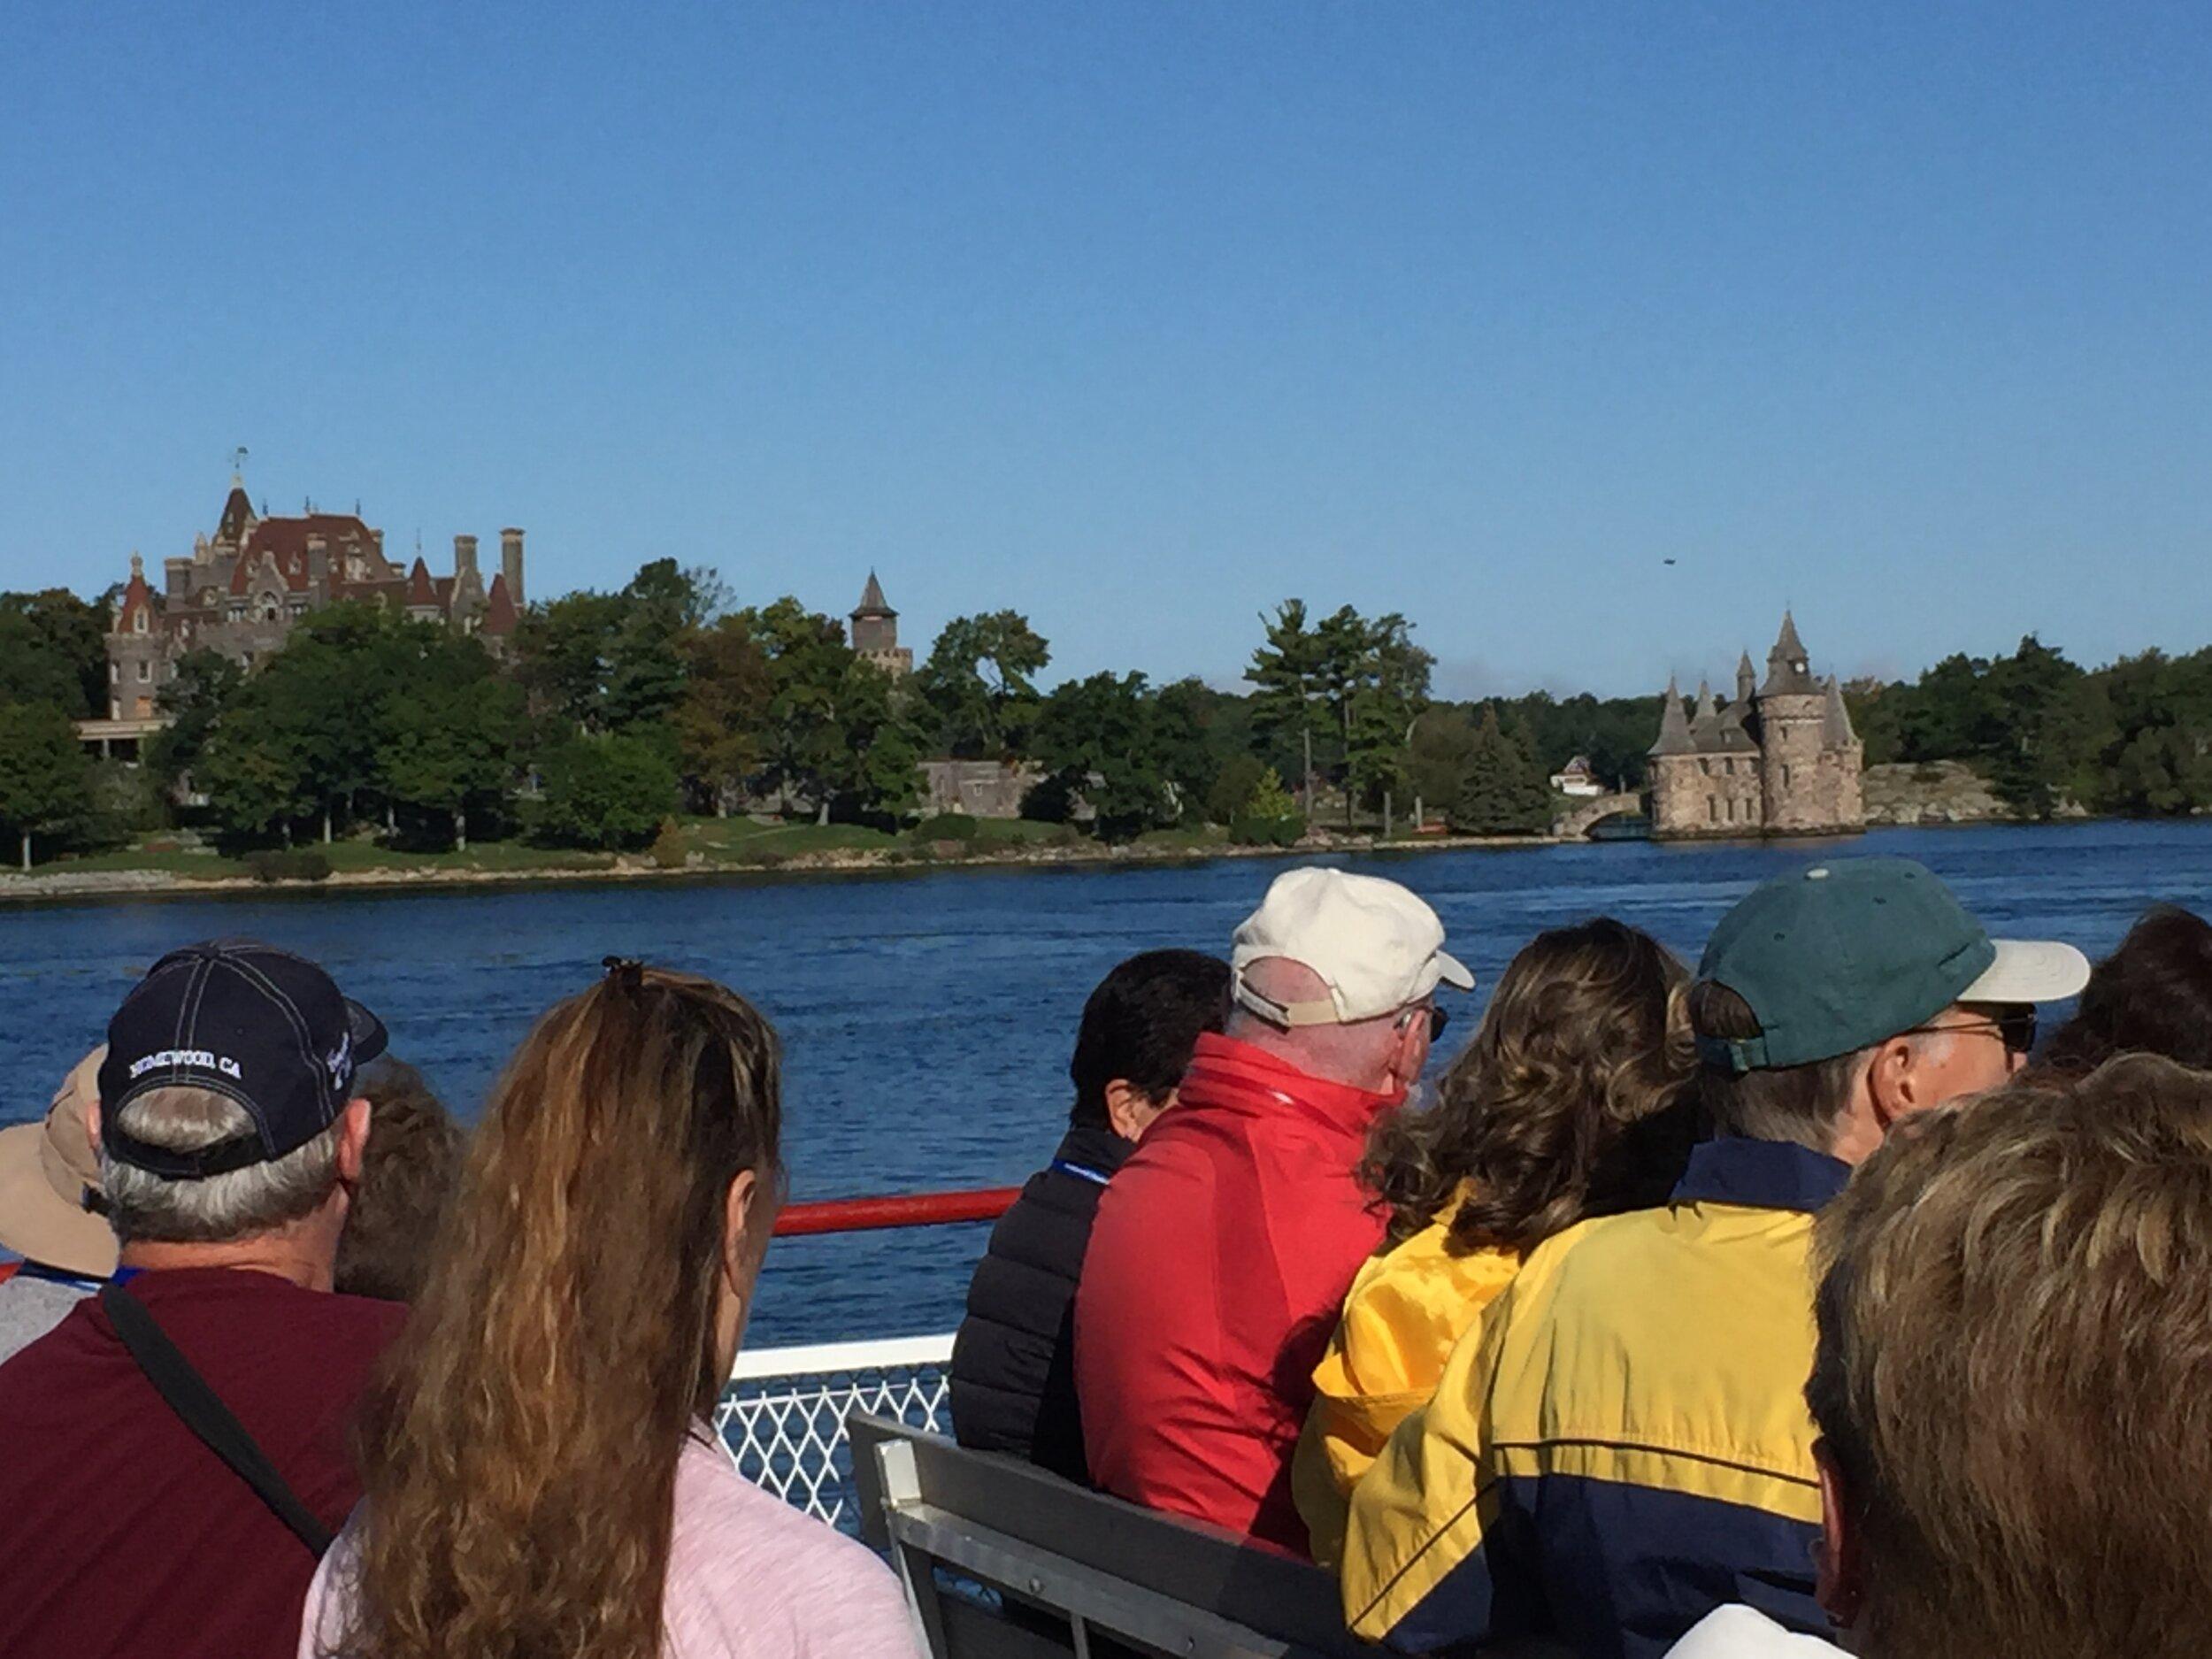 Monday's Dark Island Tour aboard Uncle Sam's Tour Boat. This is Boldt Castle